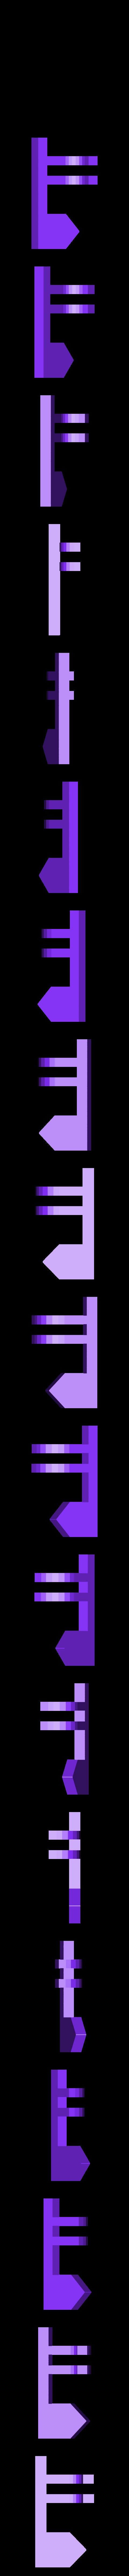 VL_Key.stl Download free STL file Viking Chest Lock • 3D printer object, Snorri